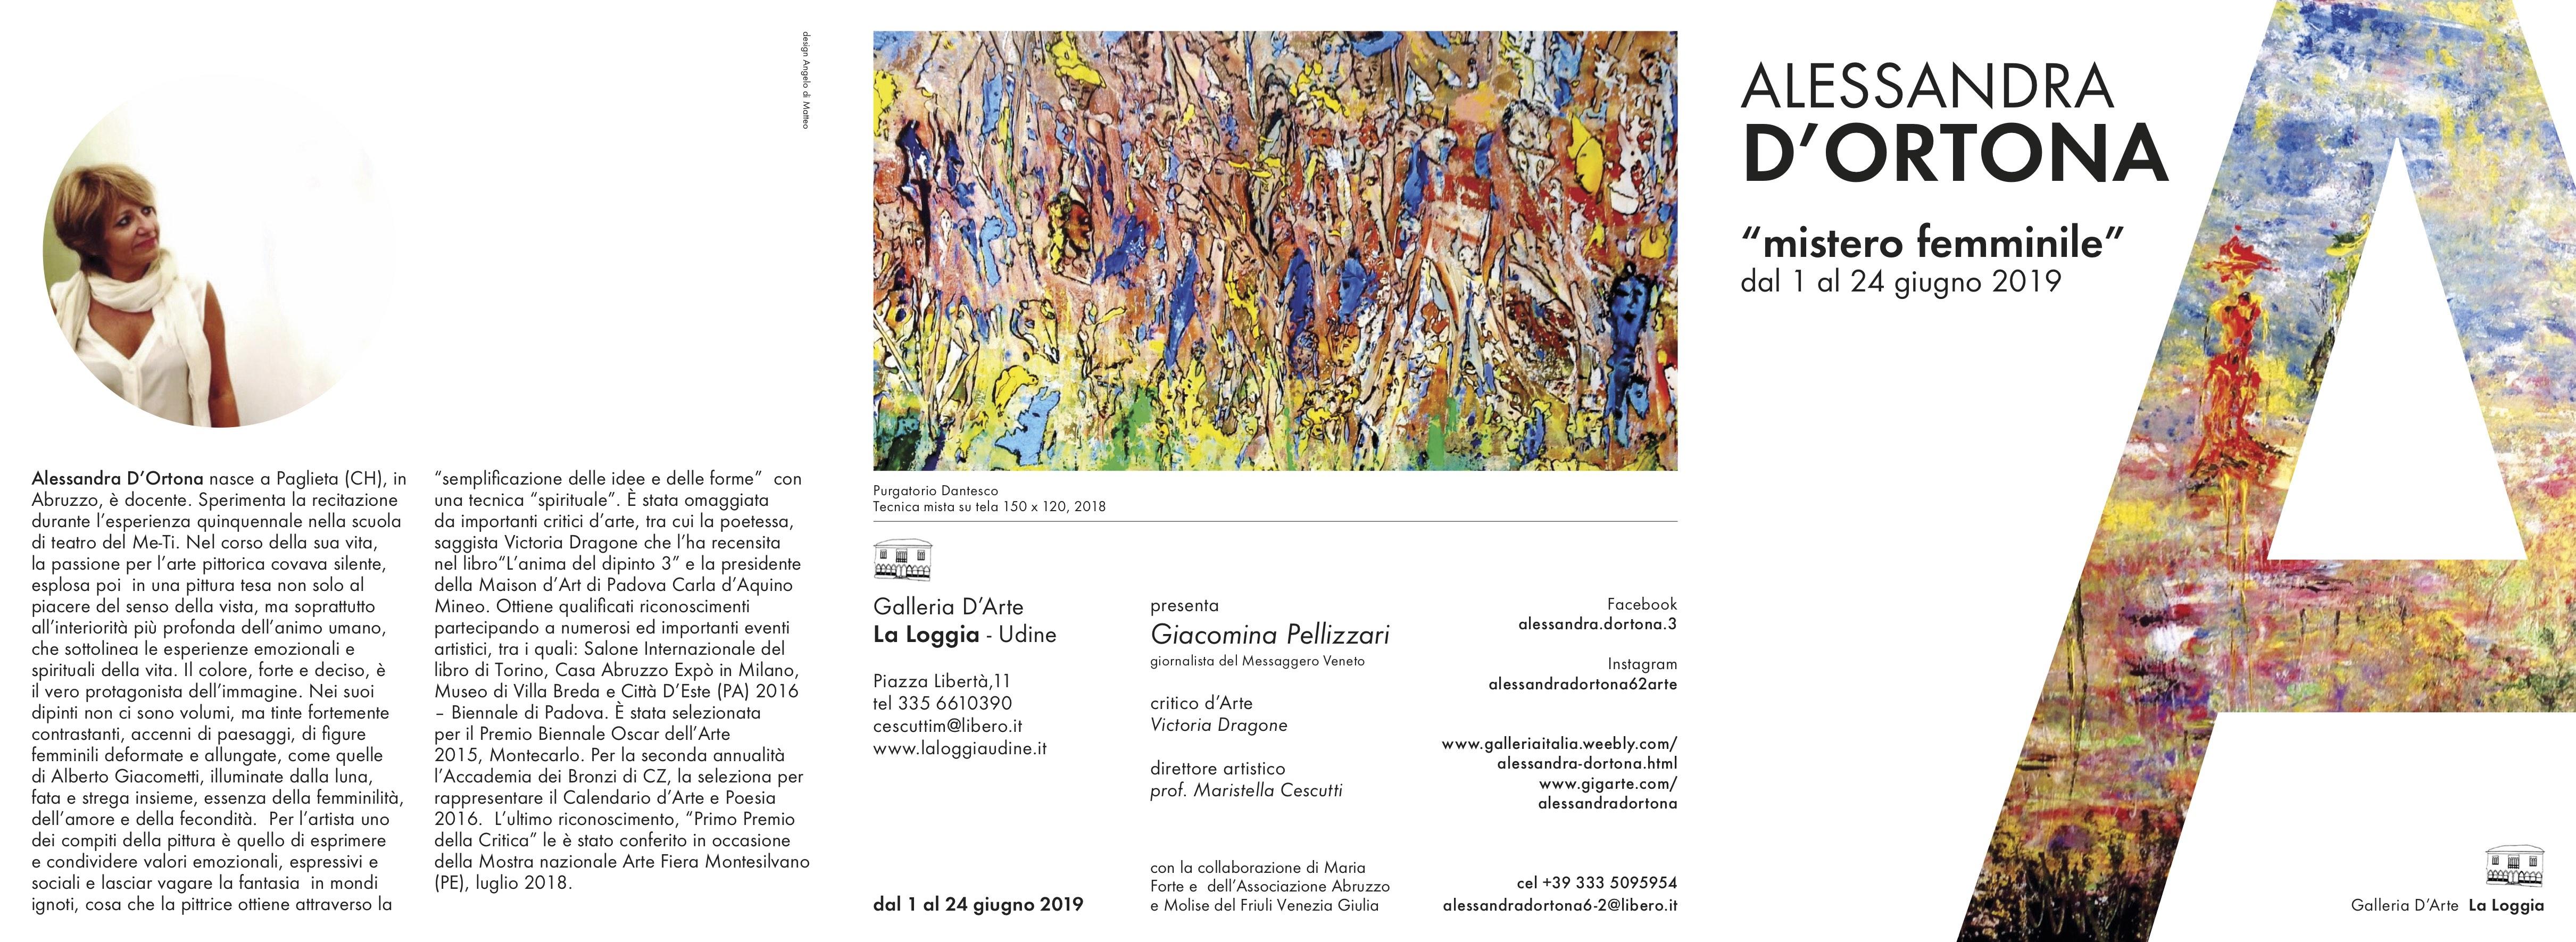 Brochure_Alessandra Dortona_1